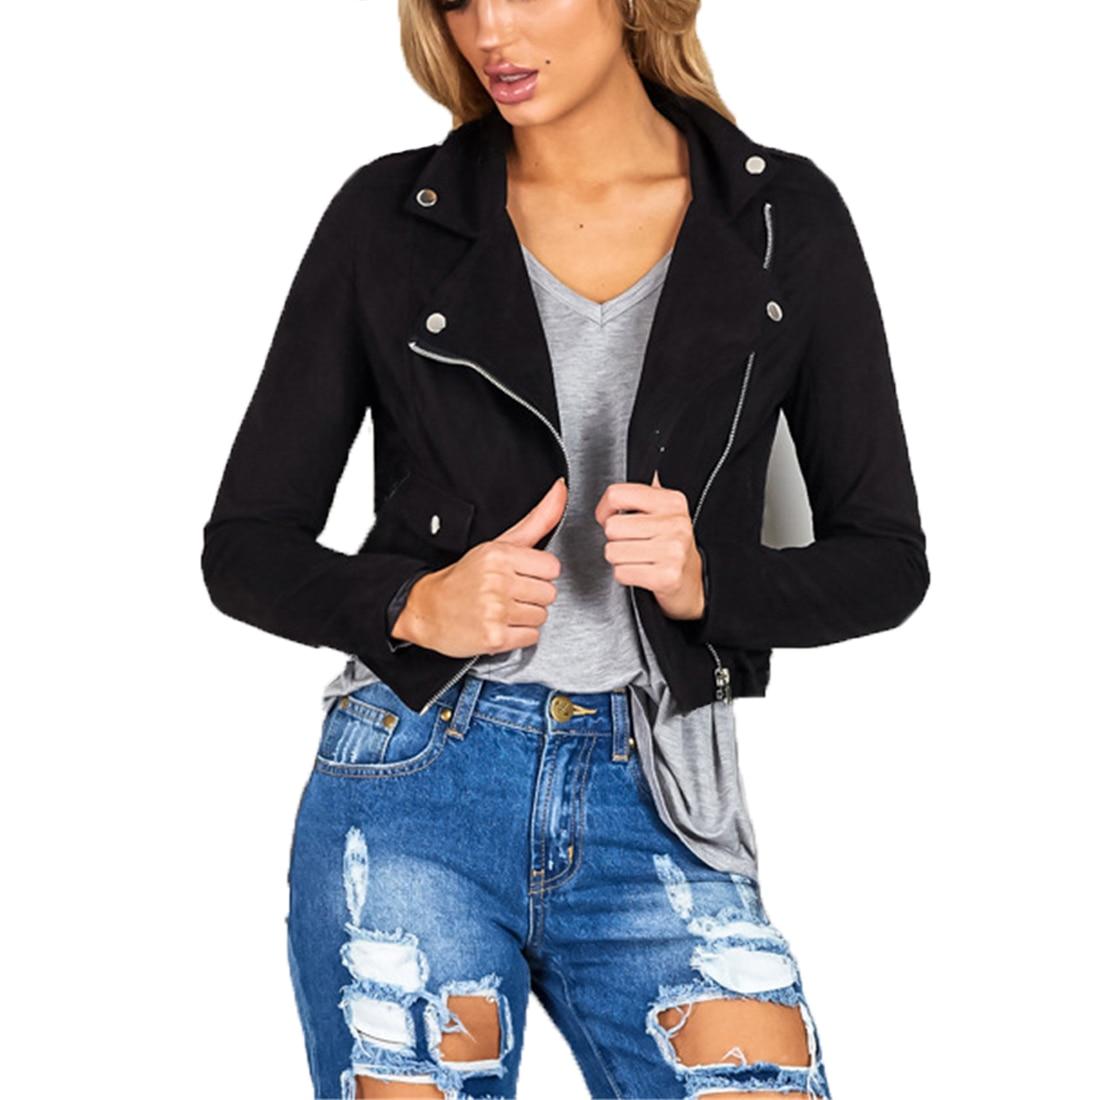 2016 Autumn Fashion Casual Cardigan font b Jacket b font Zipper Up Full Sleeve Slim font